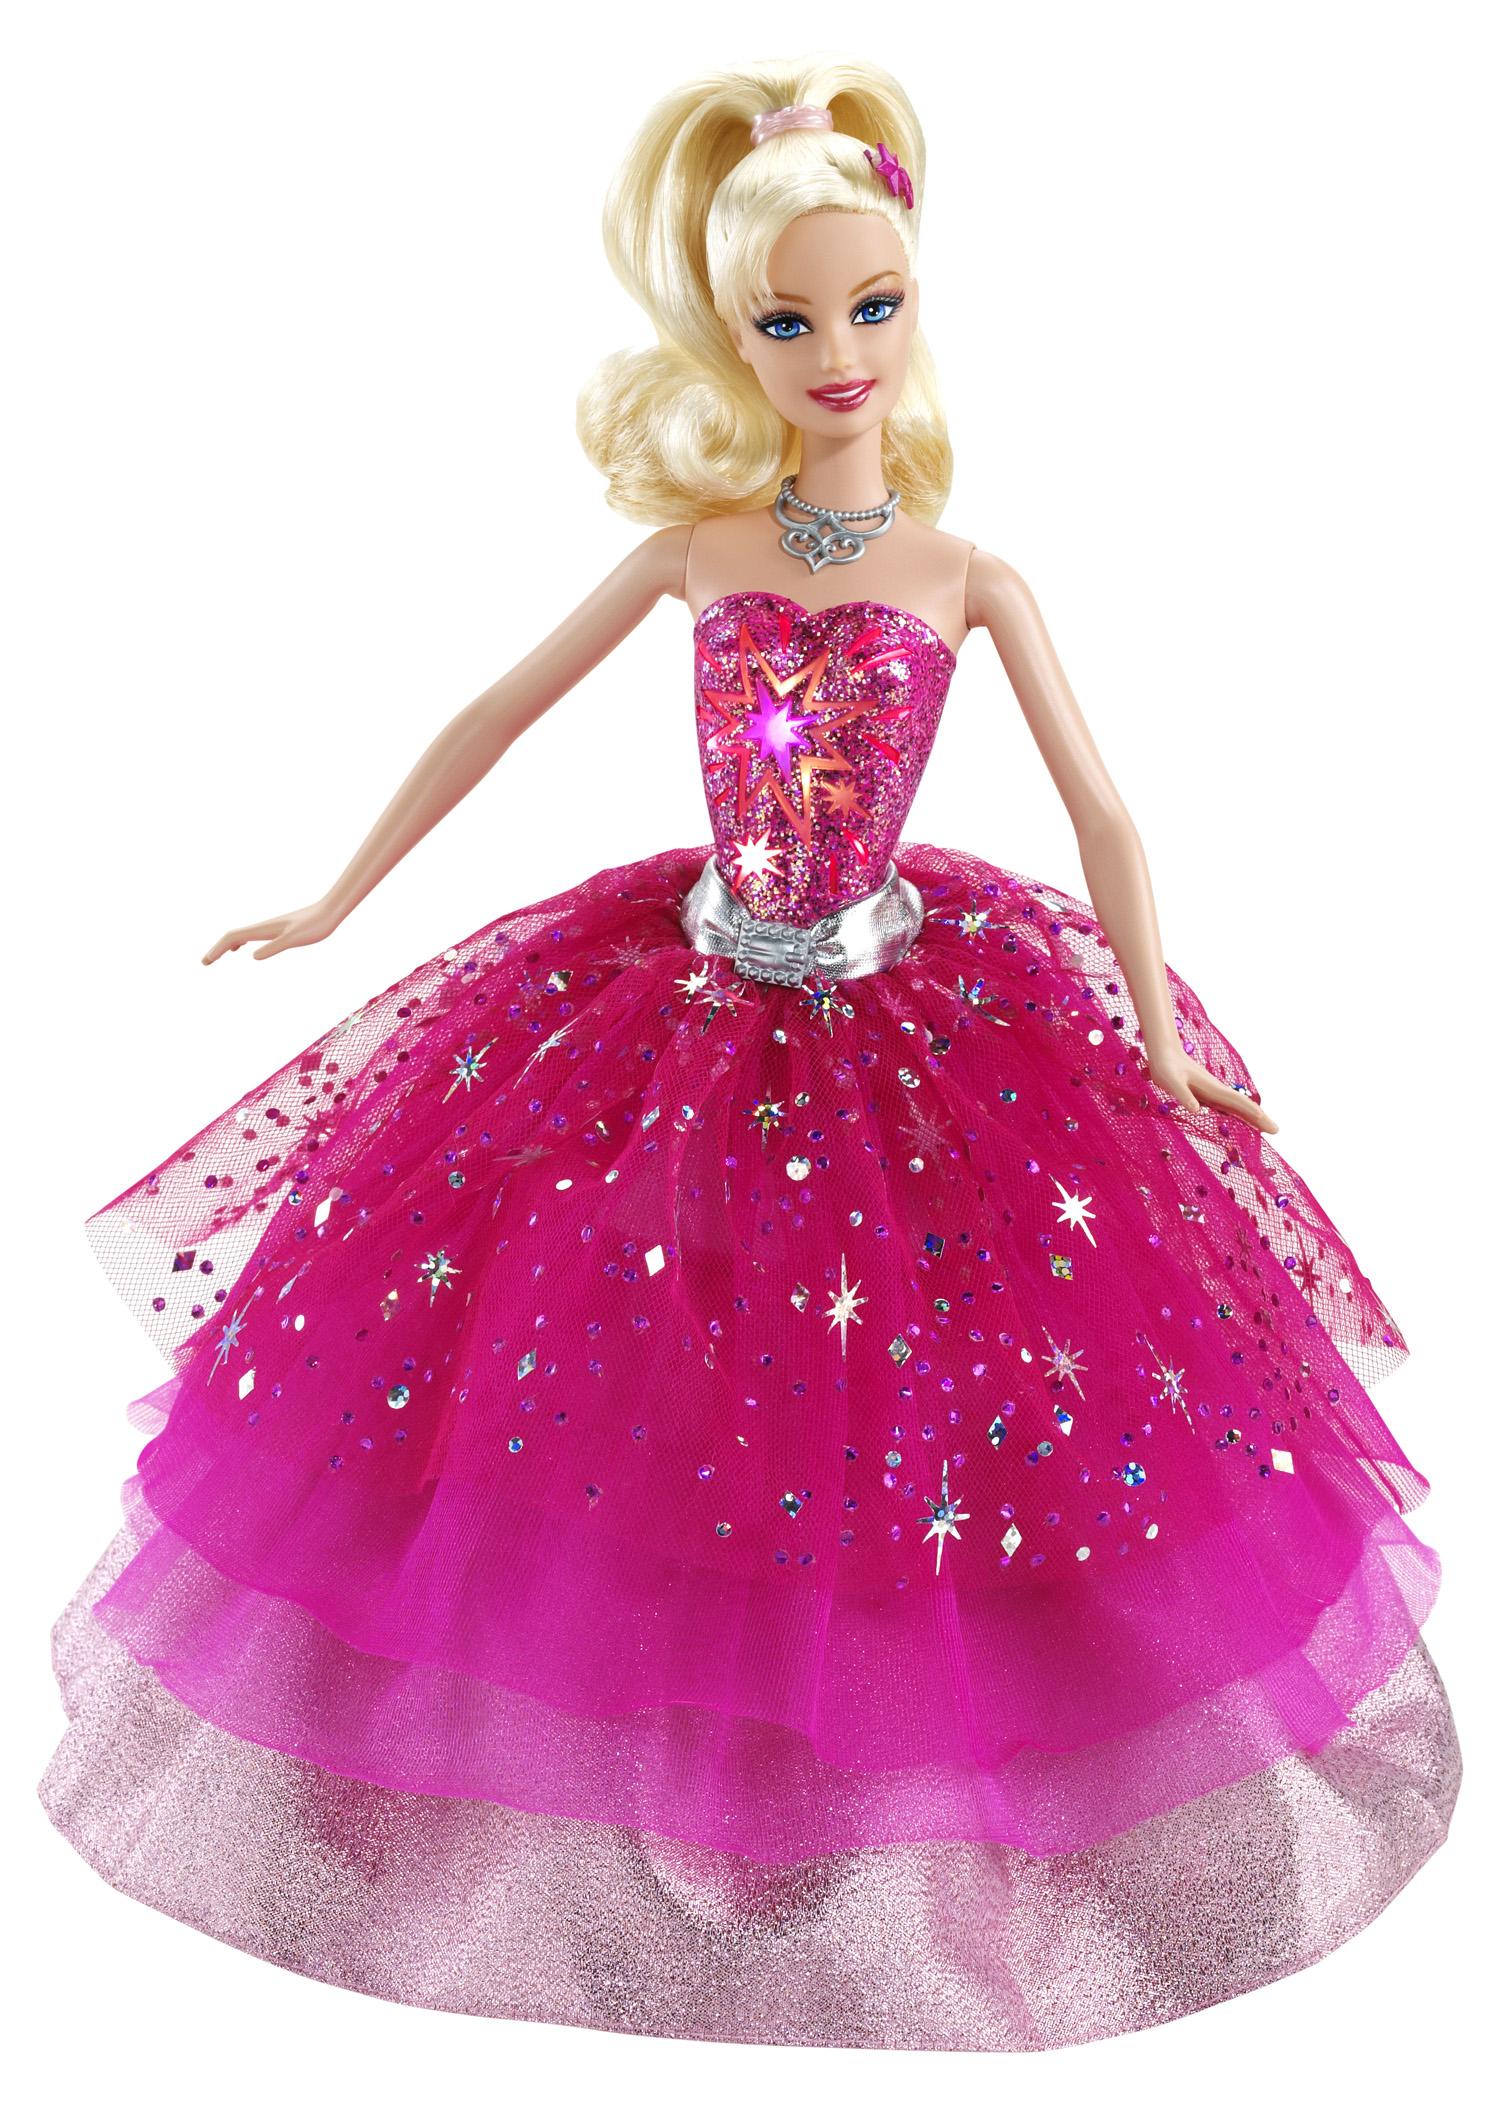 barbie wallpapers gree download